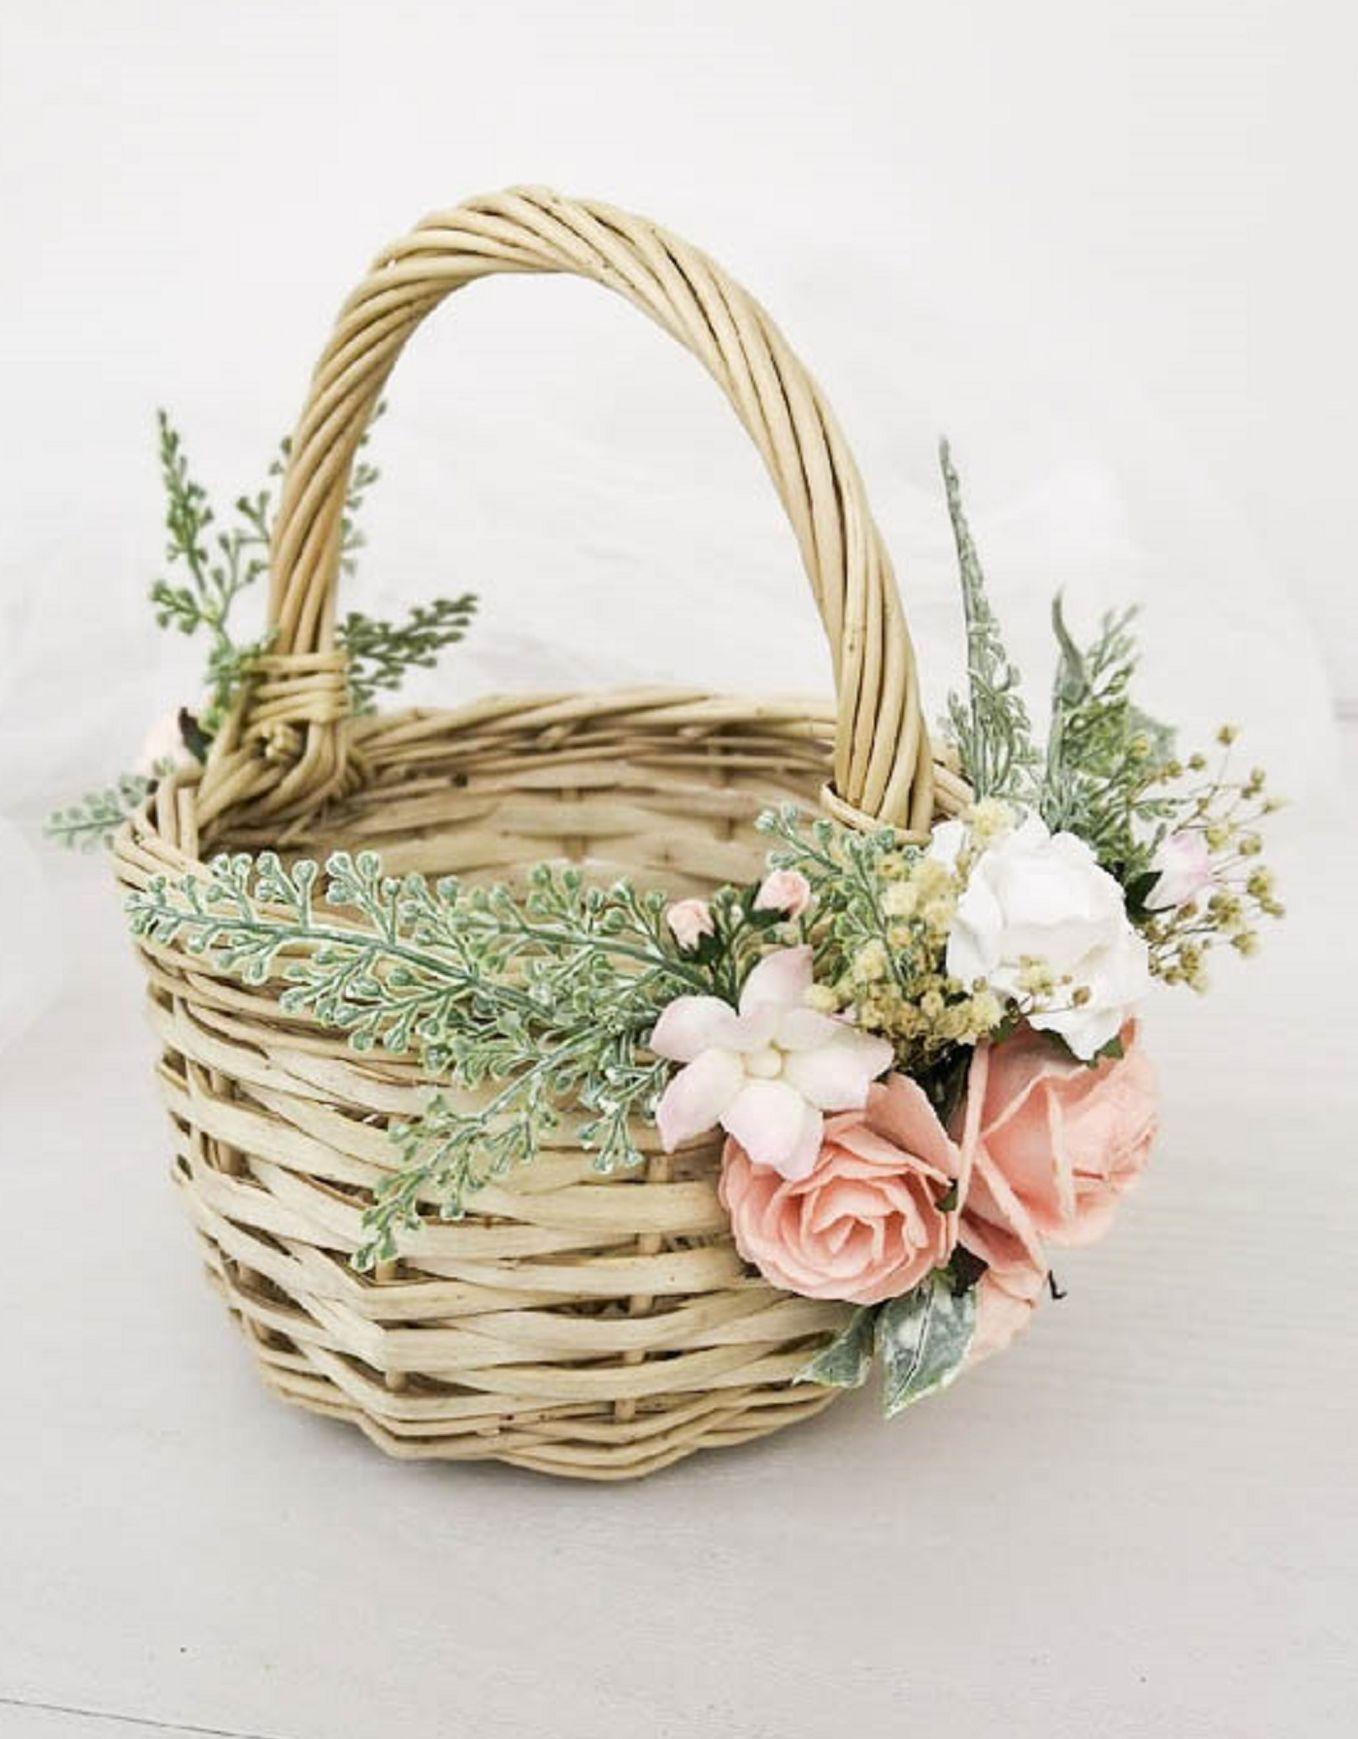 Flower girl basket wicker baskets with pink flowers rustic